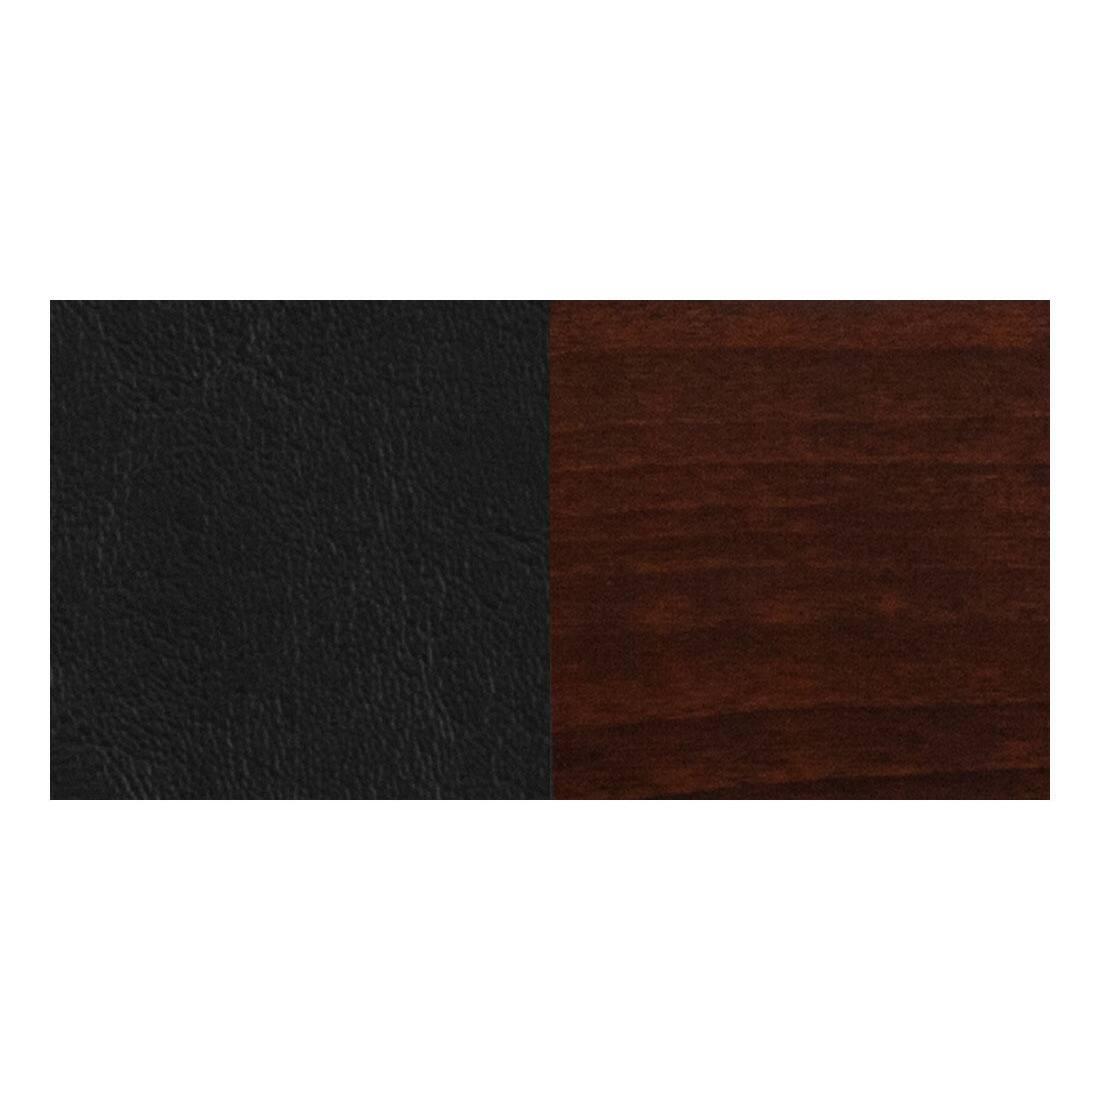 Bar amp Counter Stools For Less Overstockcom : Offex Darby Series Slat Back Walnut Wooden Restaurant Barstool 34f0e1f8 3b81 4152 a4bb 93acbd72b425 from www.overstock.com size 1100 x 1100 jpeg 26kB